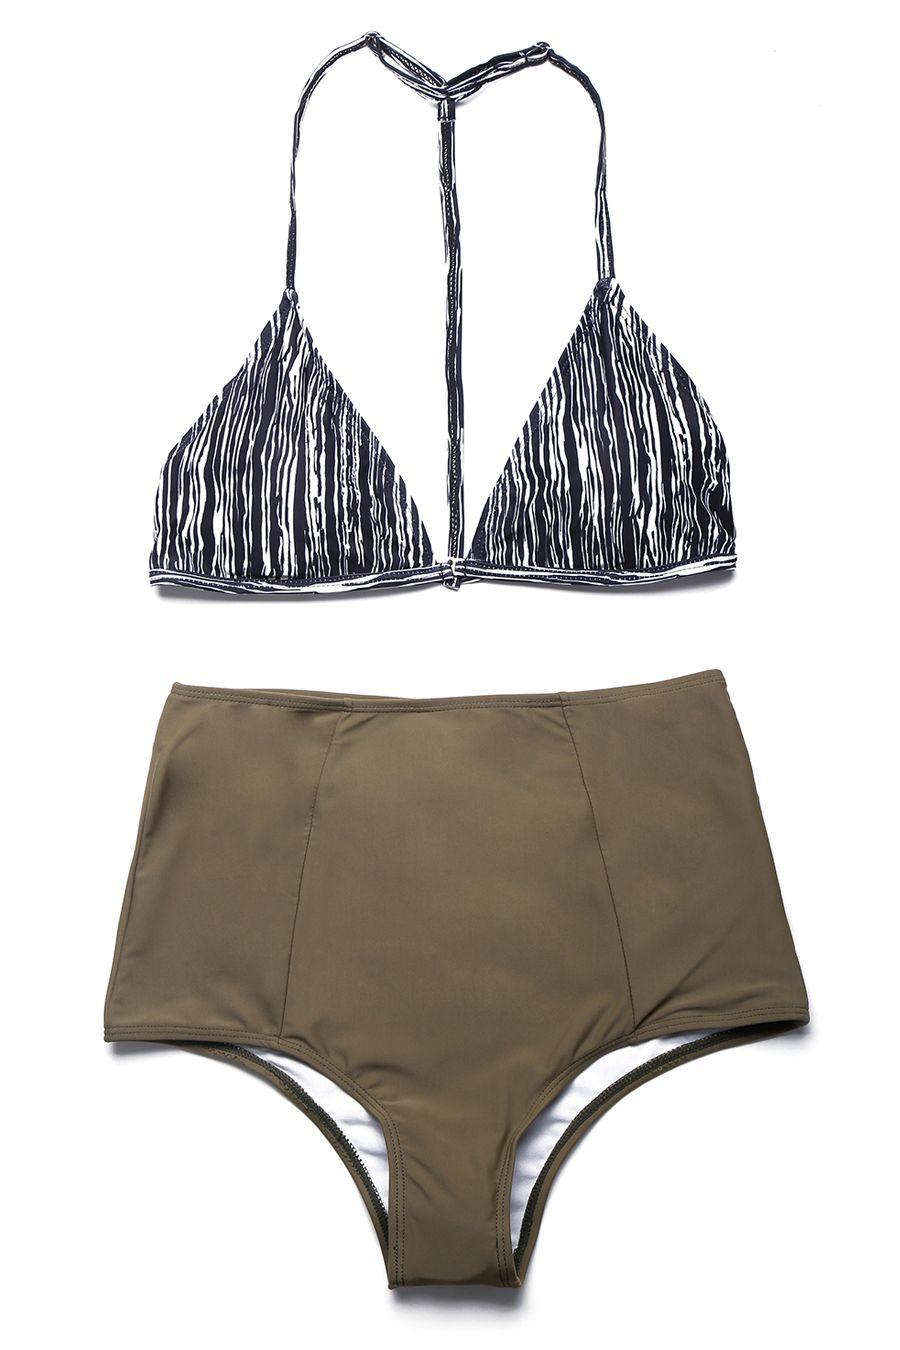 Vintage Two Piece Swimsuit High Waisted Bikini Bottom